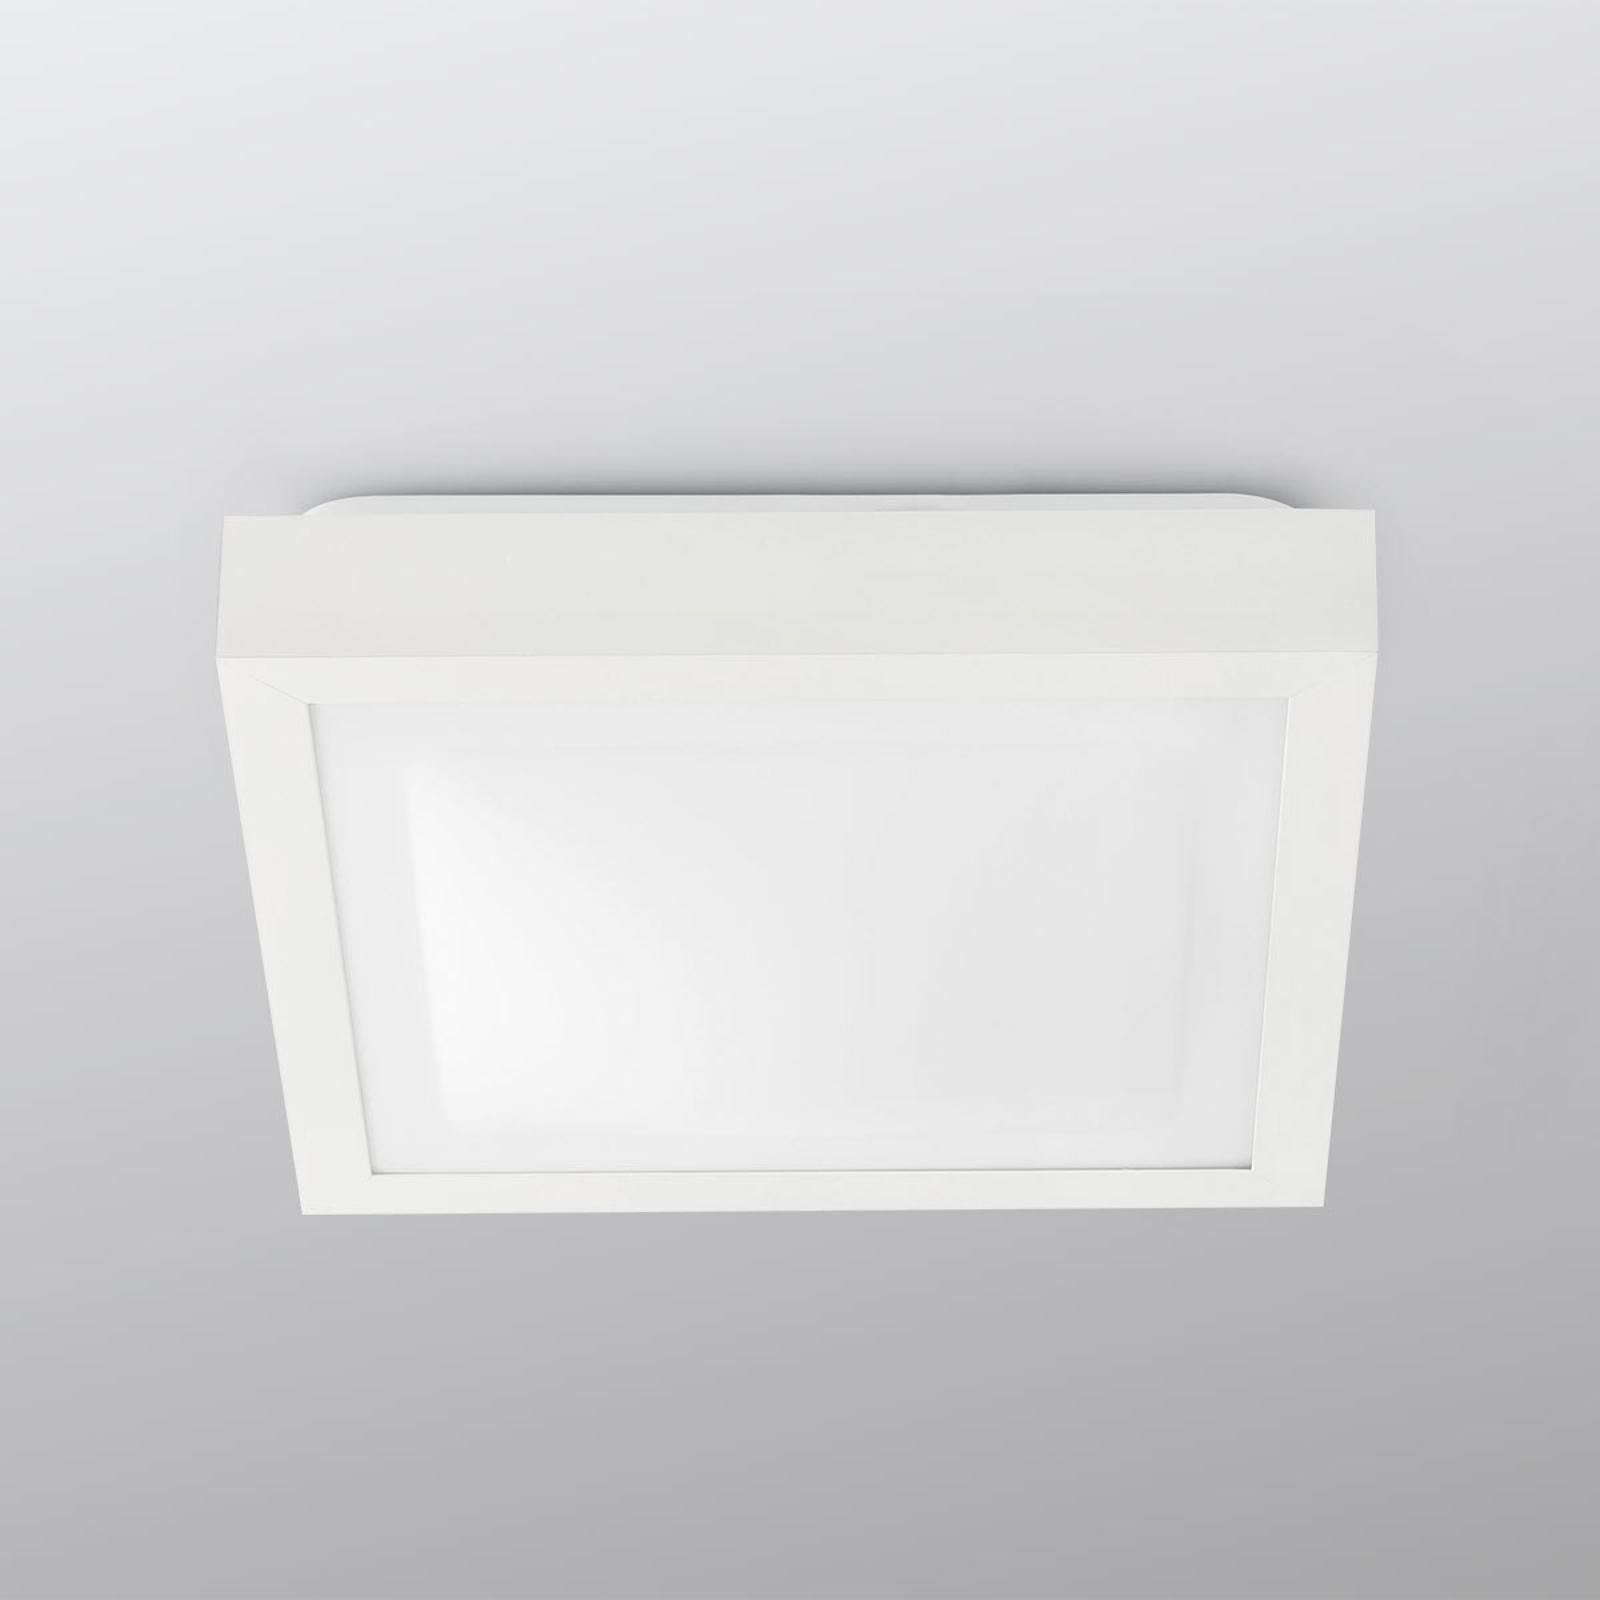 Kwadratowa lampa sufitowa Tola do łazienki